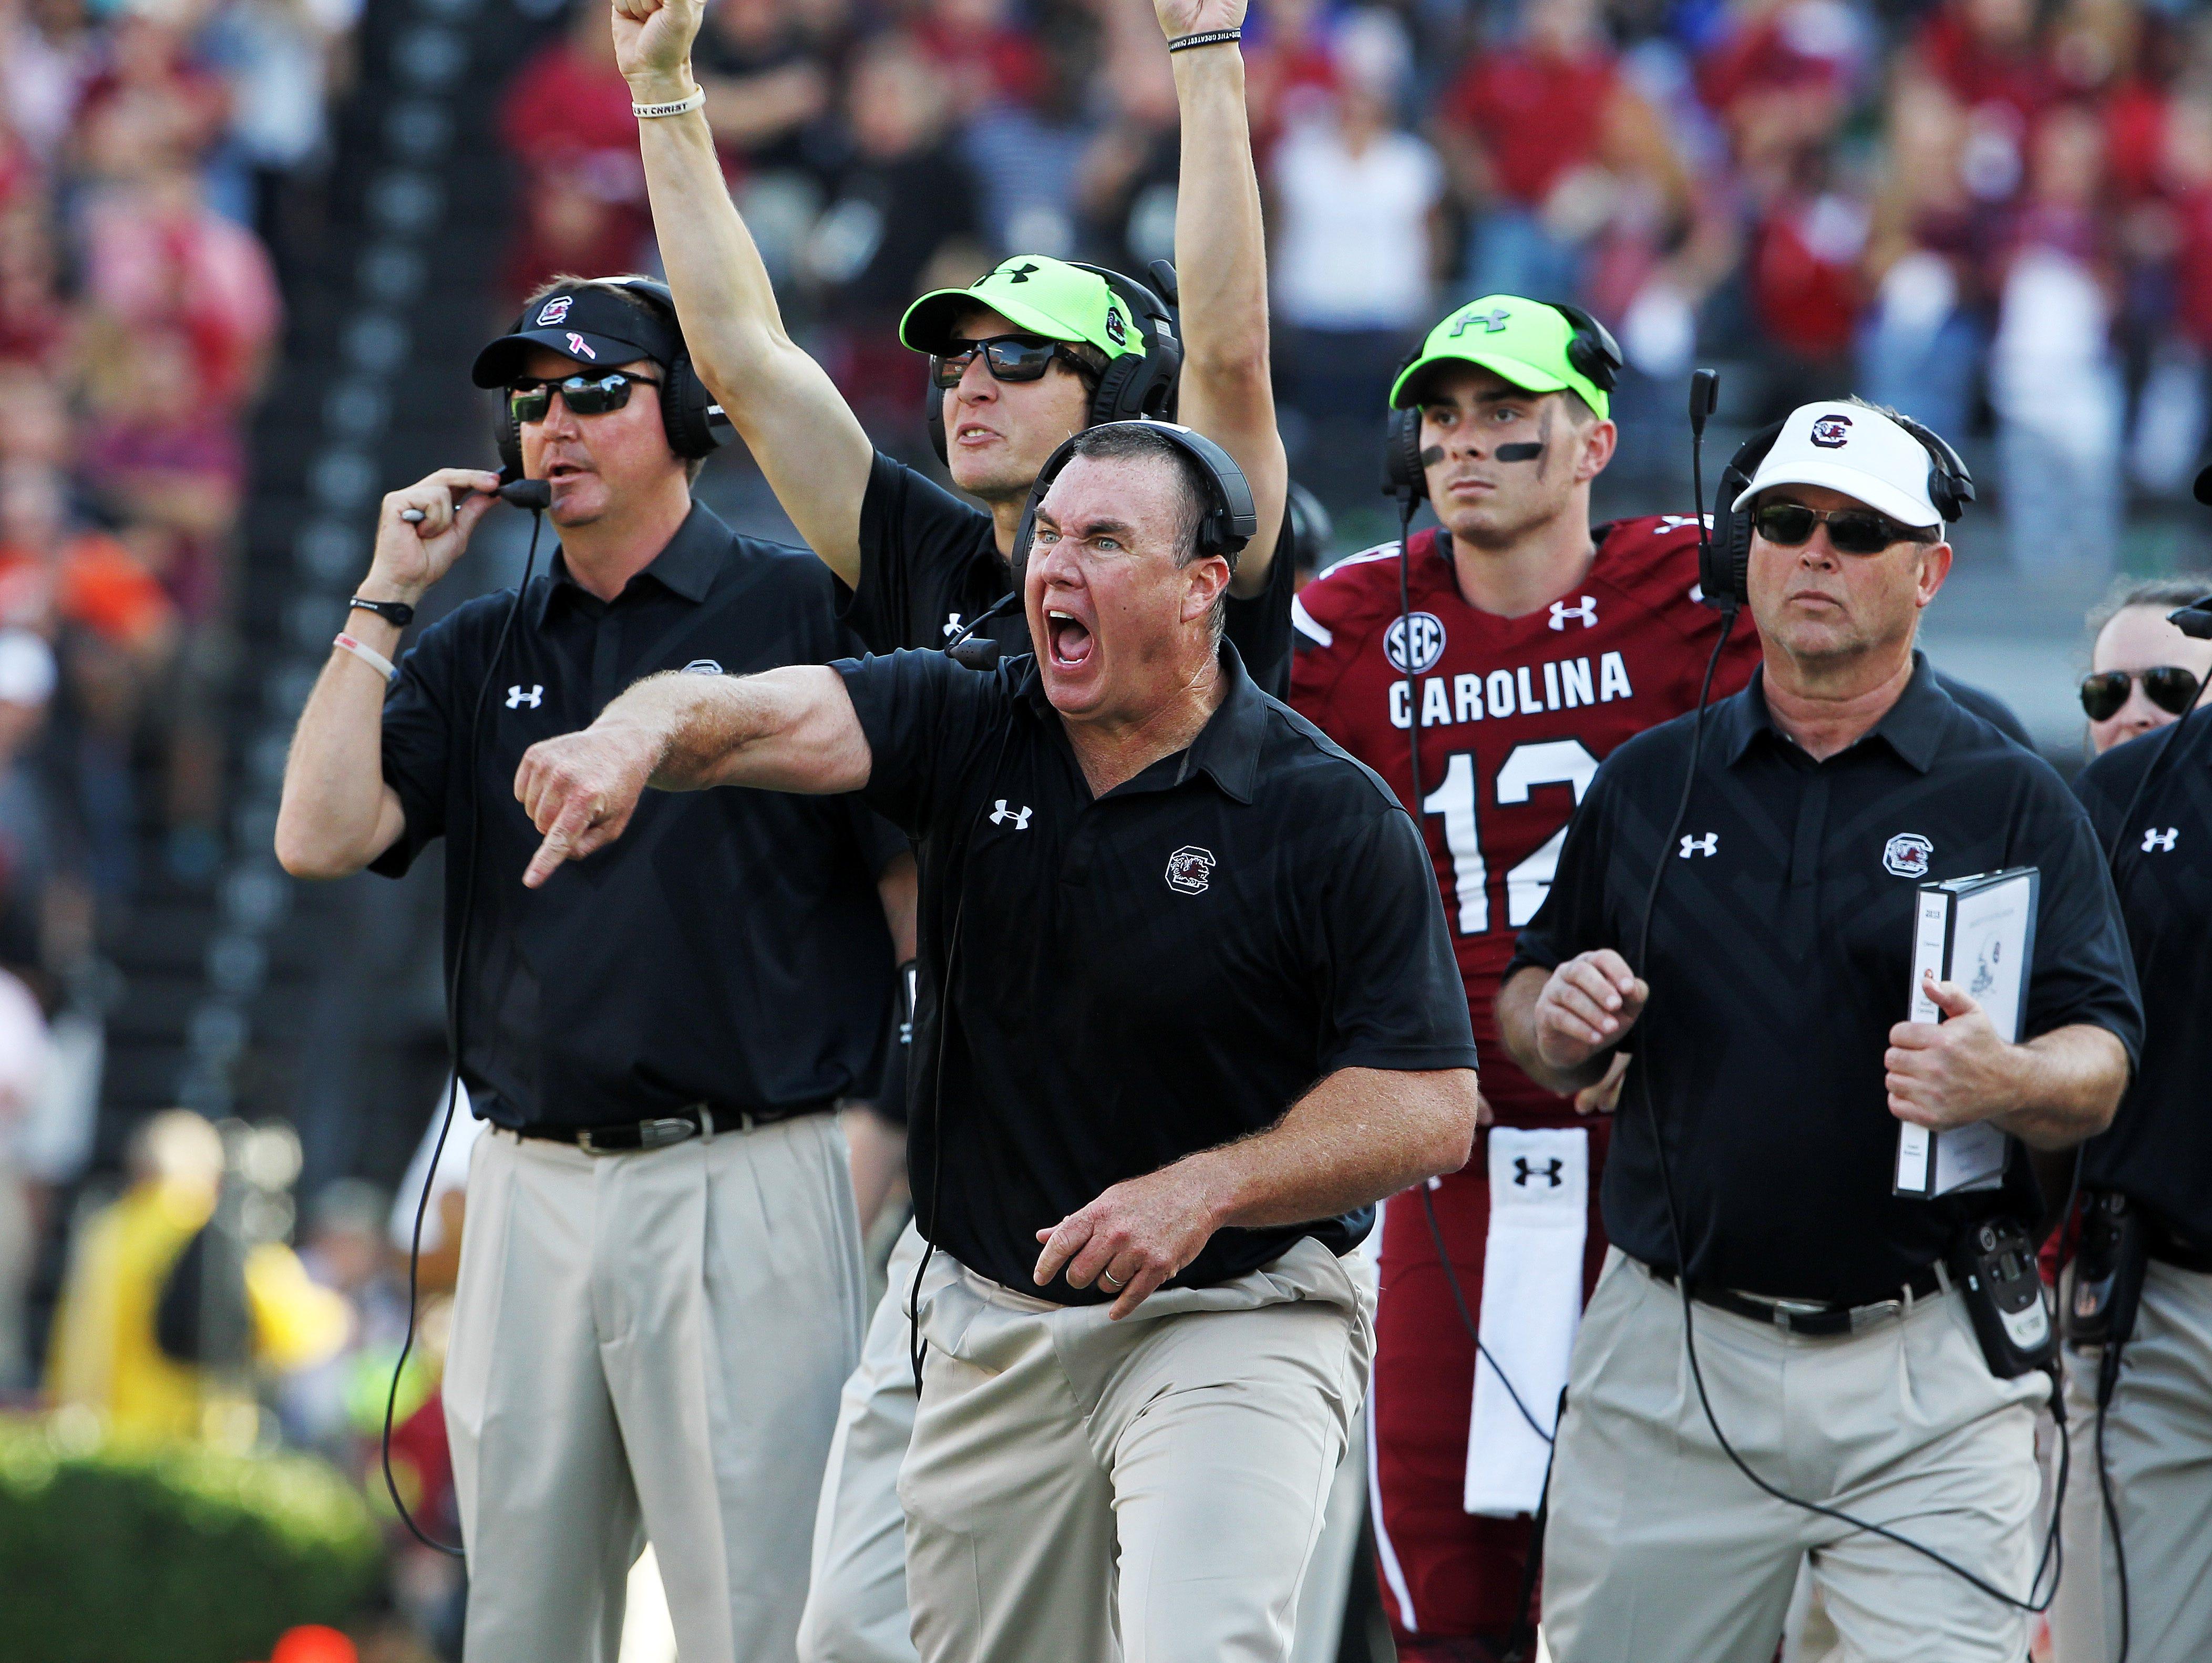 South Carolina interim head coach Shawn Elliott yells out instructions in the second half at Williams-Brice Stadium, Saturday, November 28, 2015.